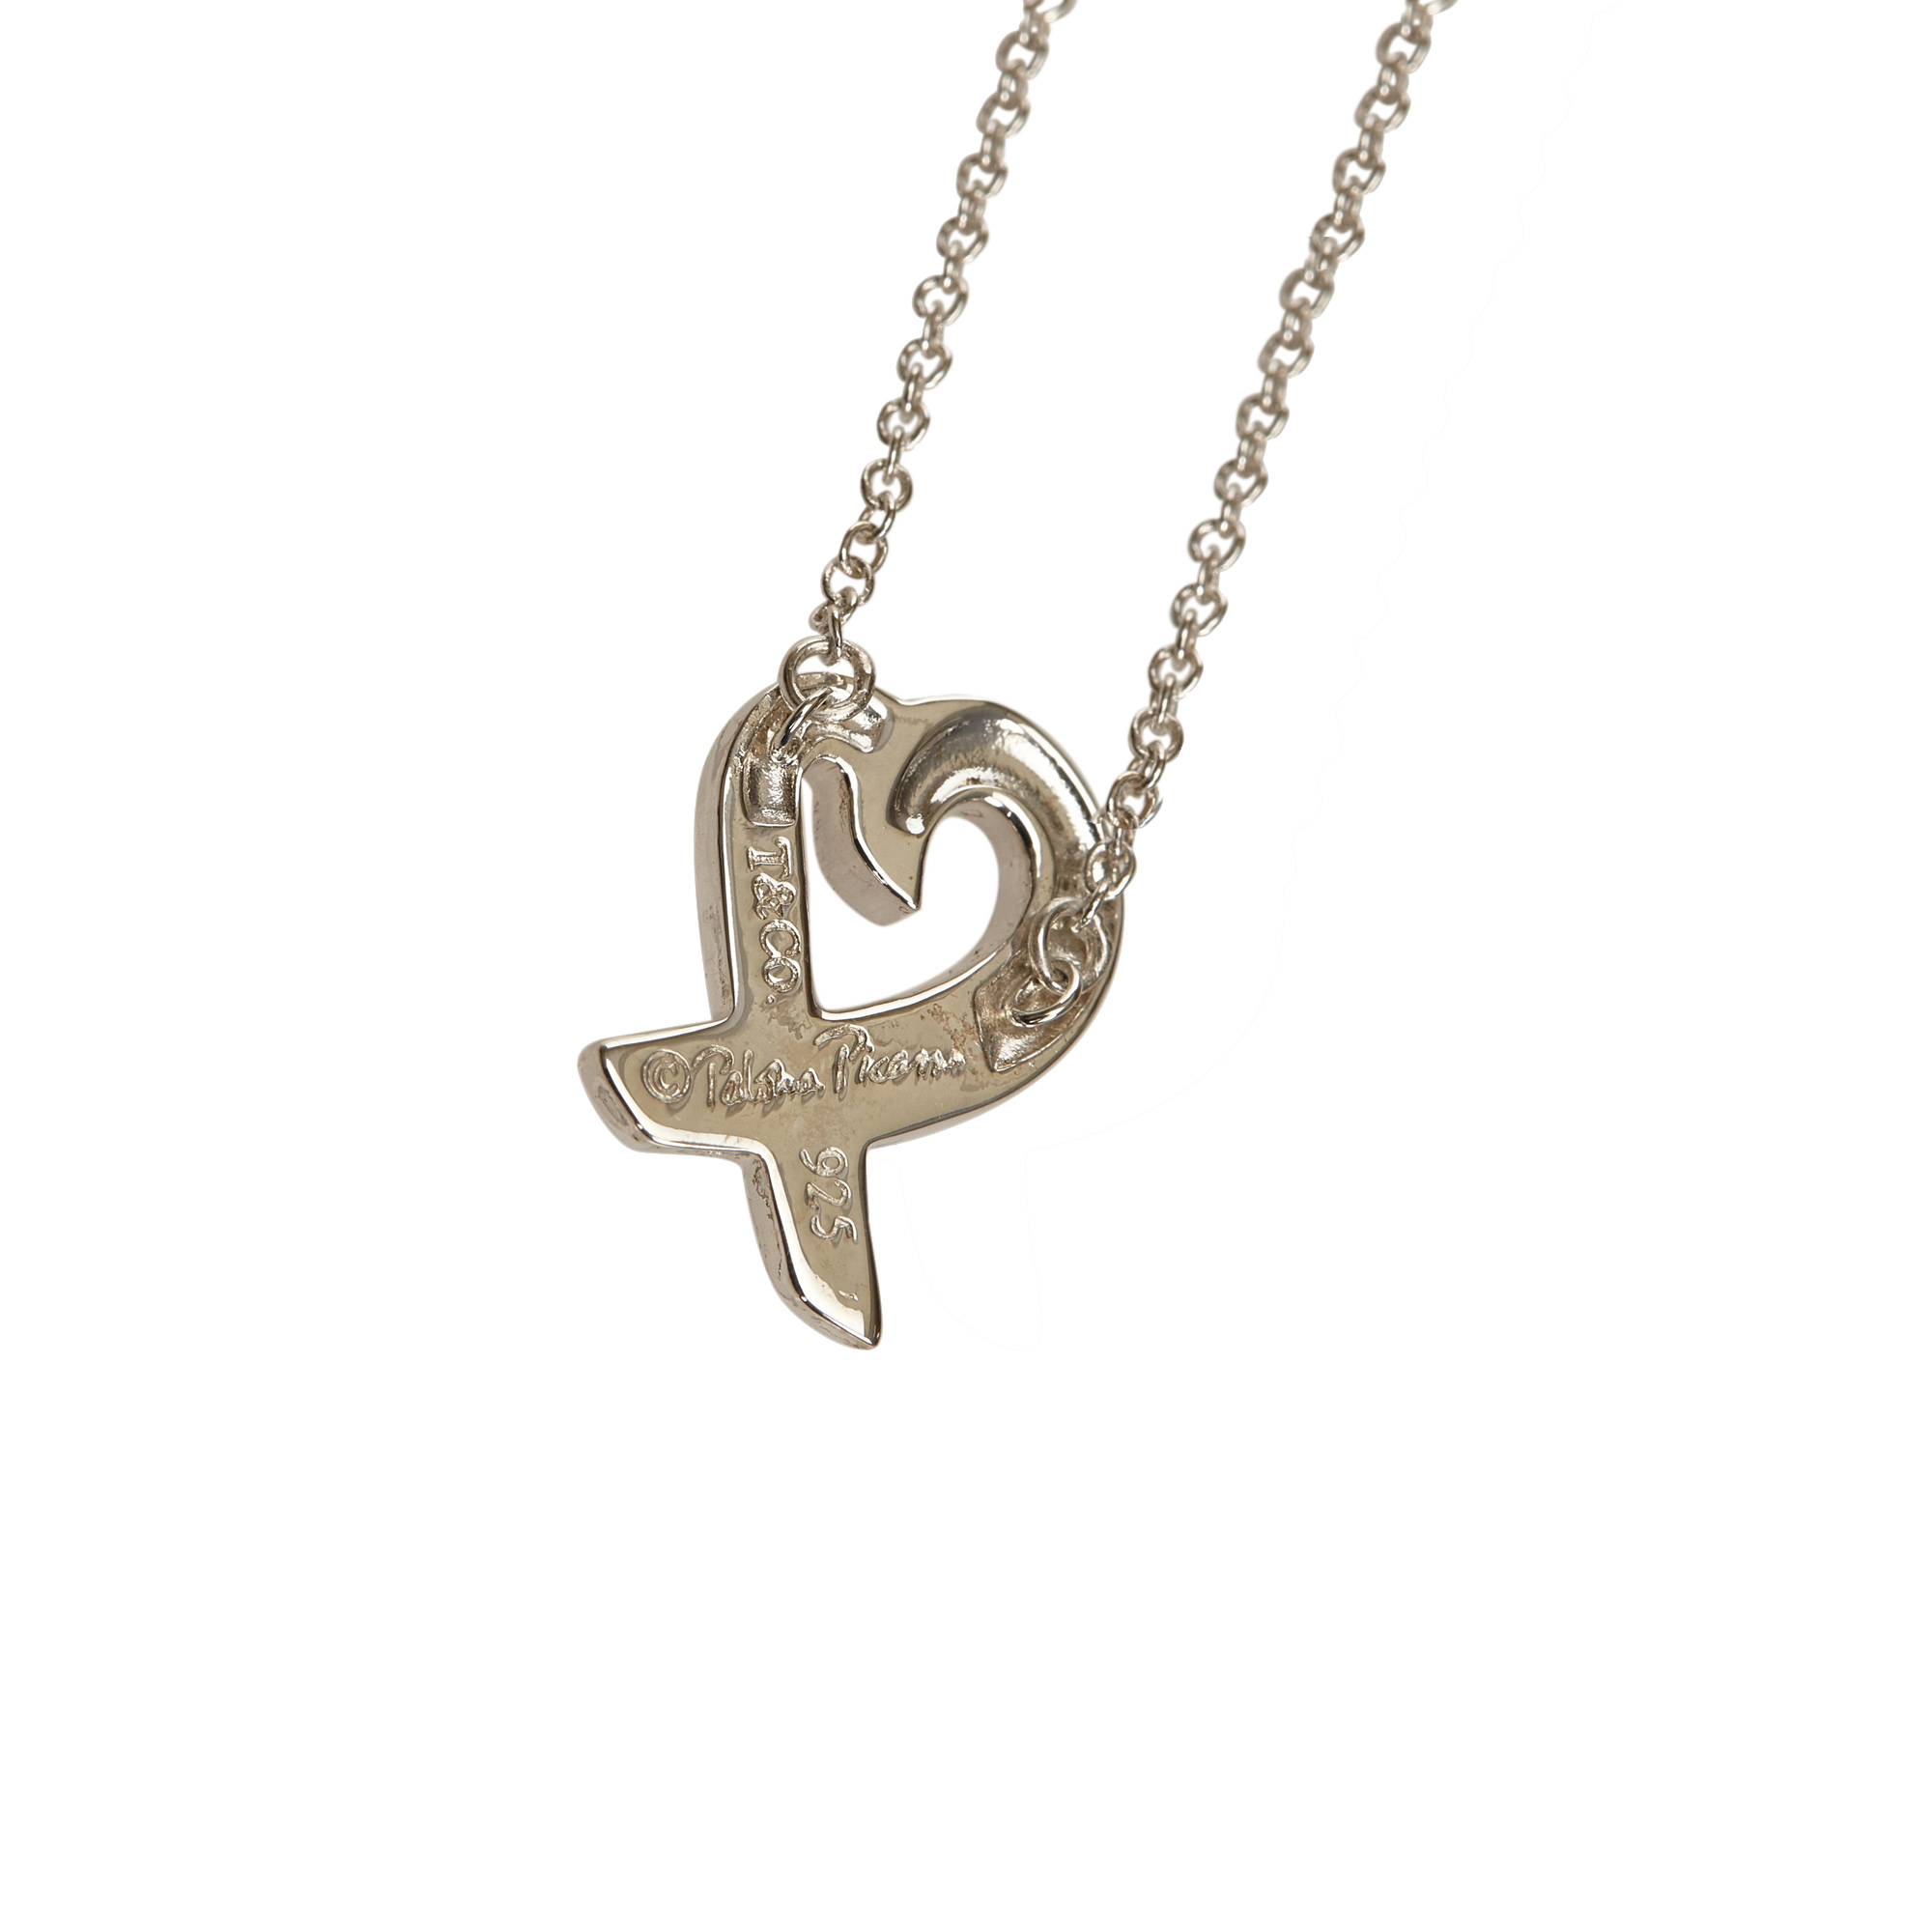 baf87740b Paloma Picasso Loving Heart Silver Pendant Necklace. nextprev. prevnext